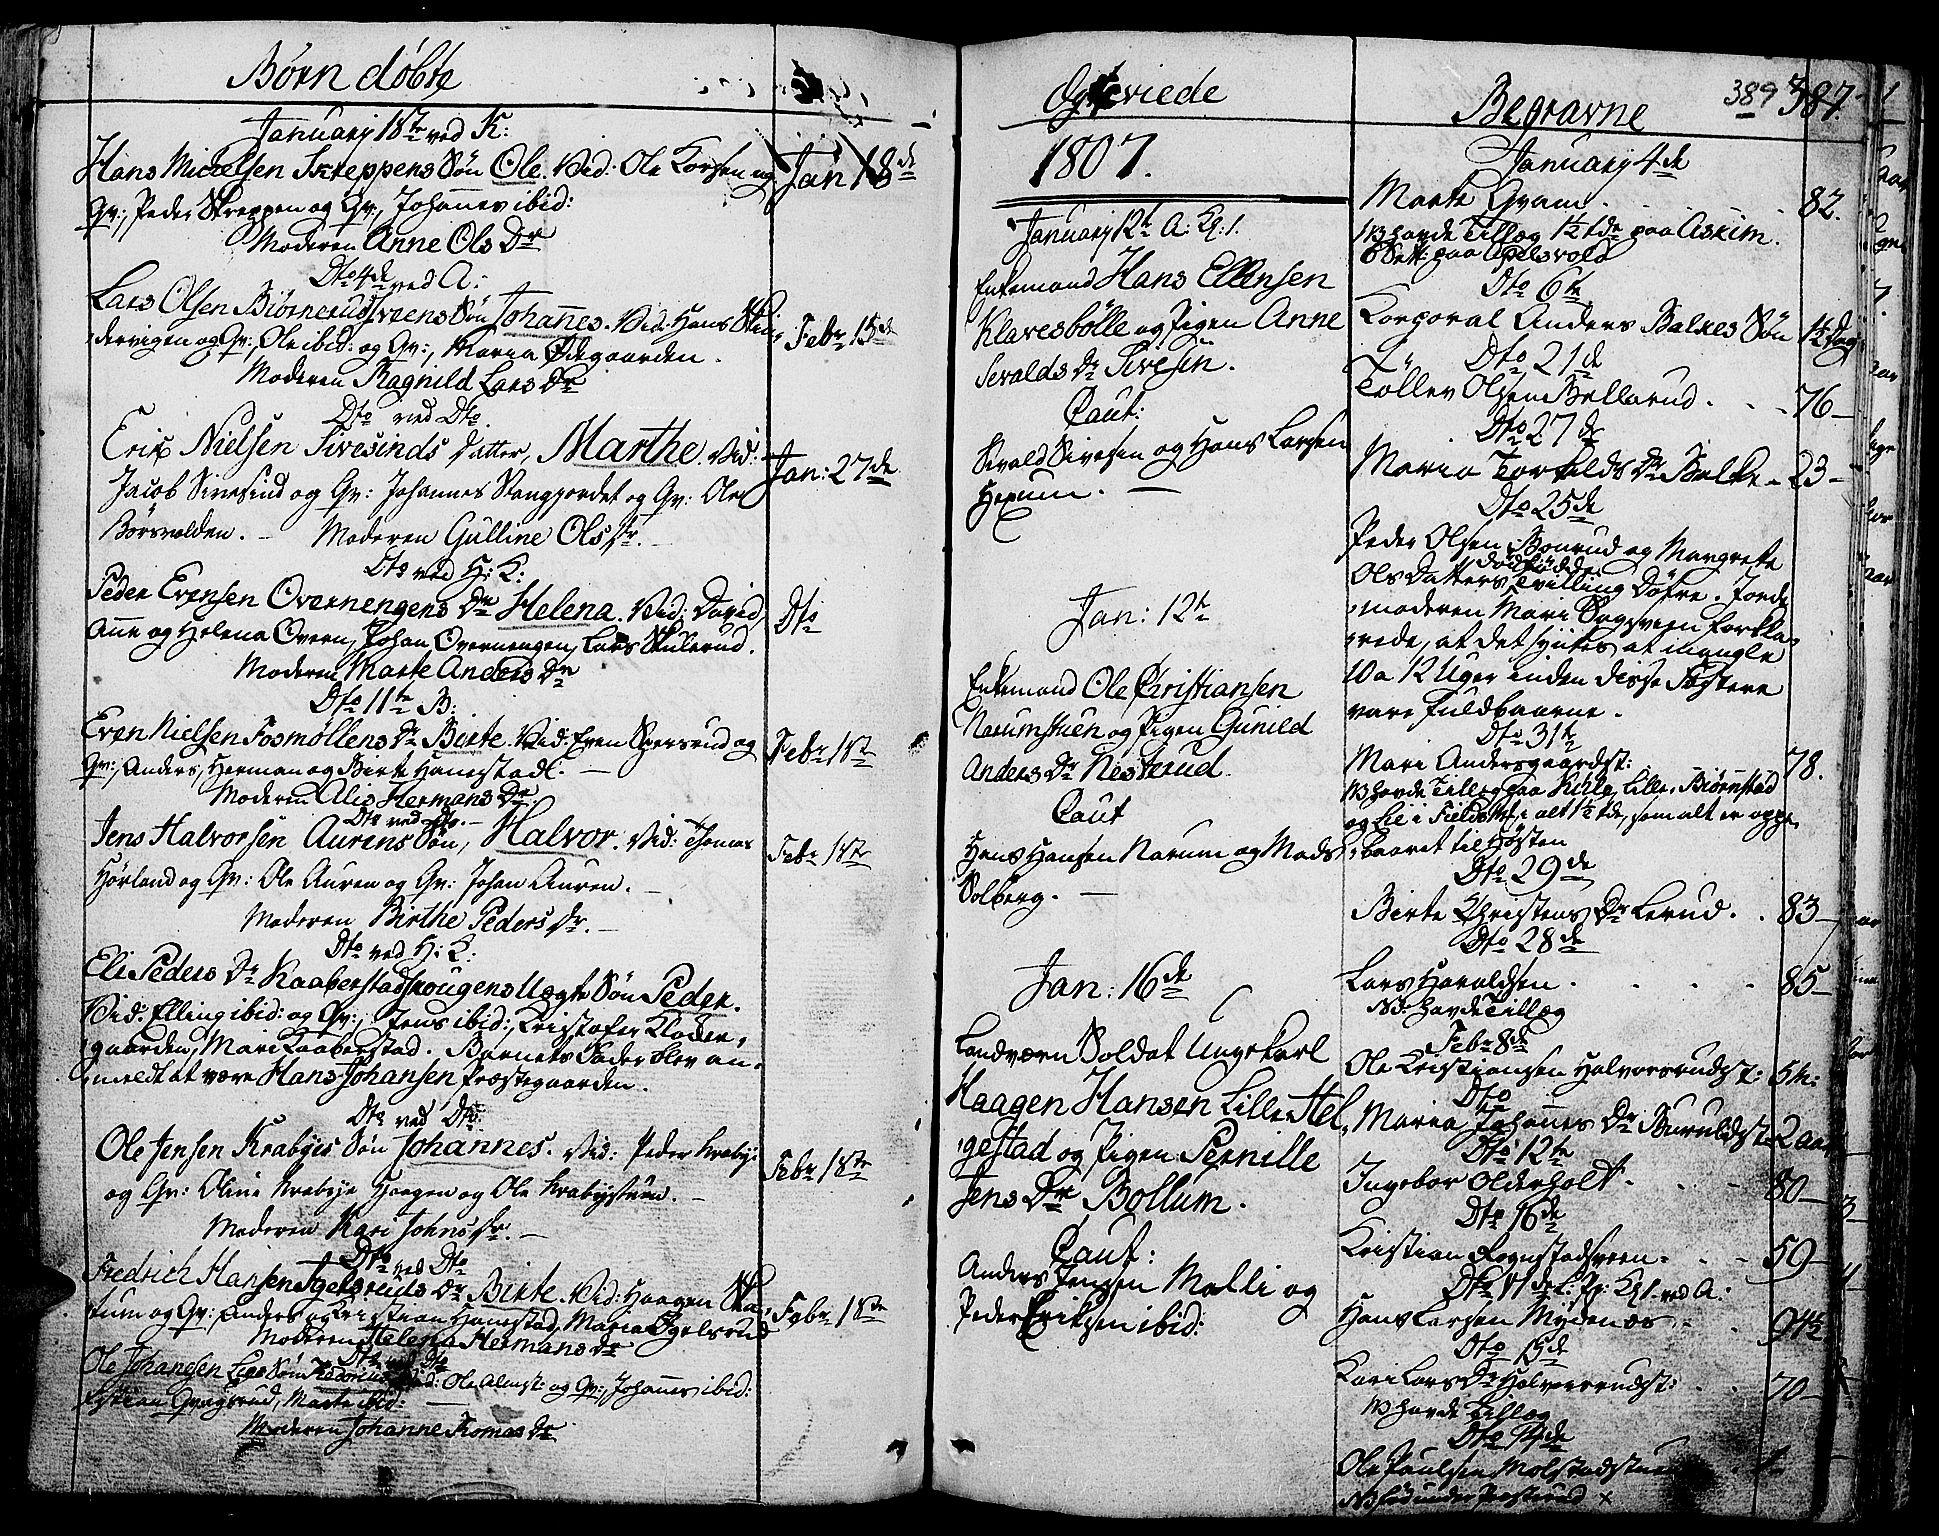 SAH, Toten prestekontor, Ministerialbok nr. 7, 1794-1809, s. 389